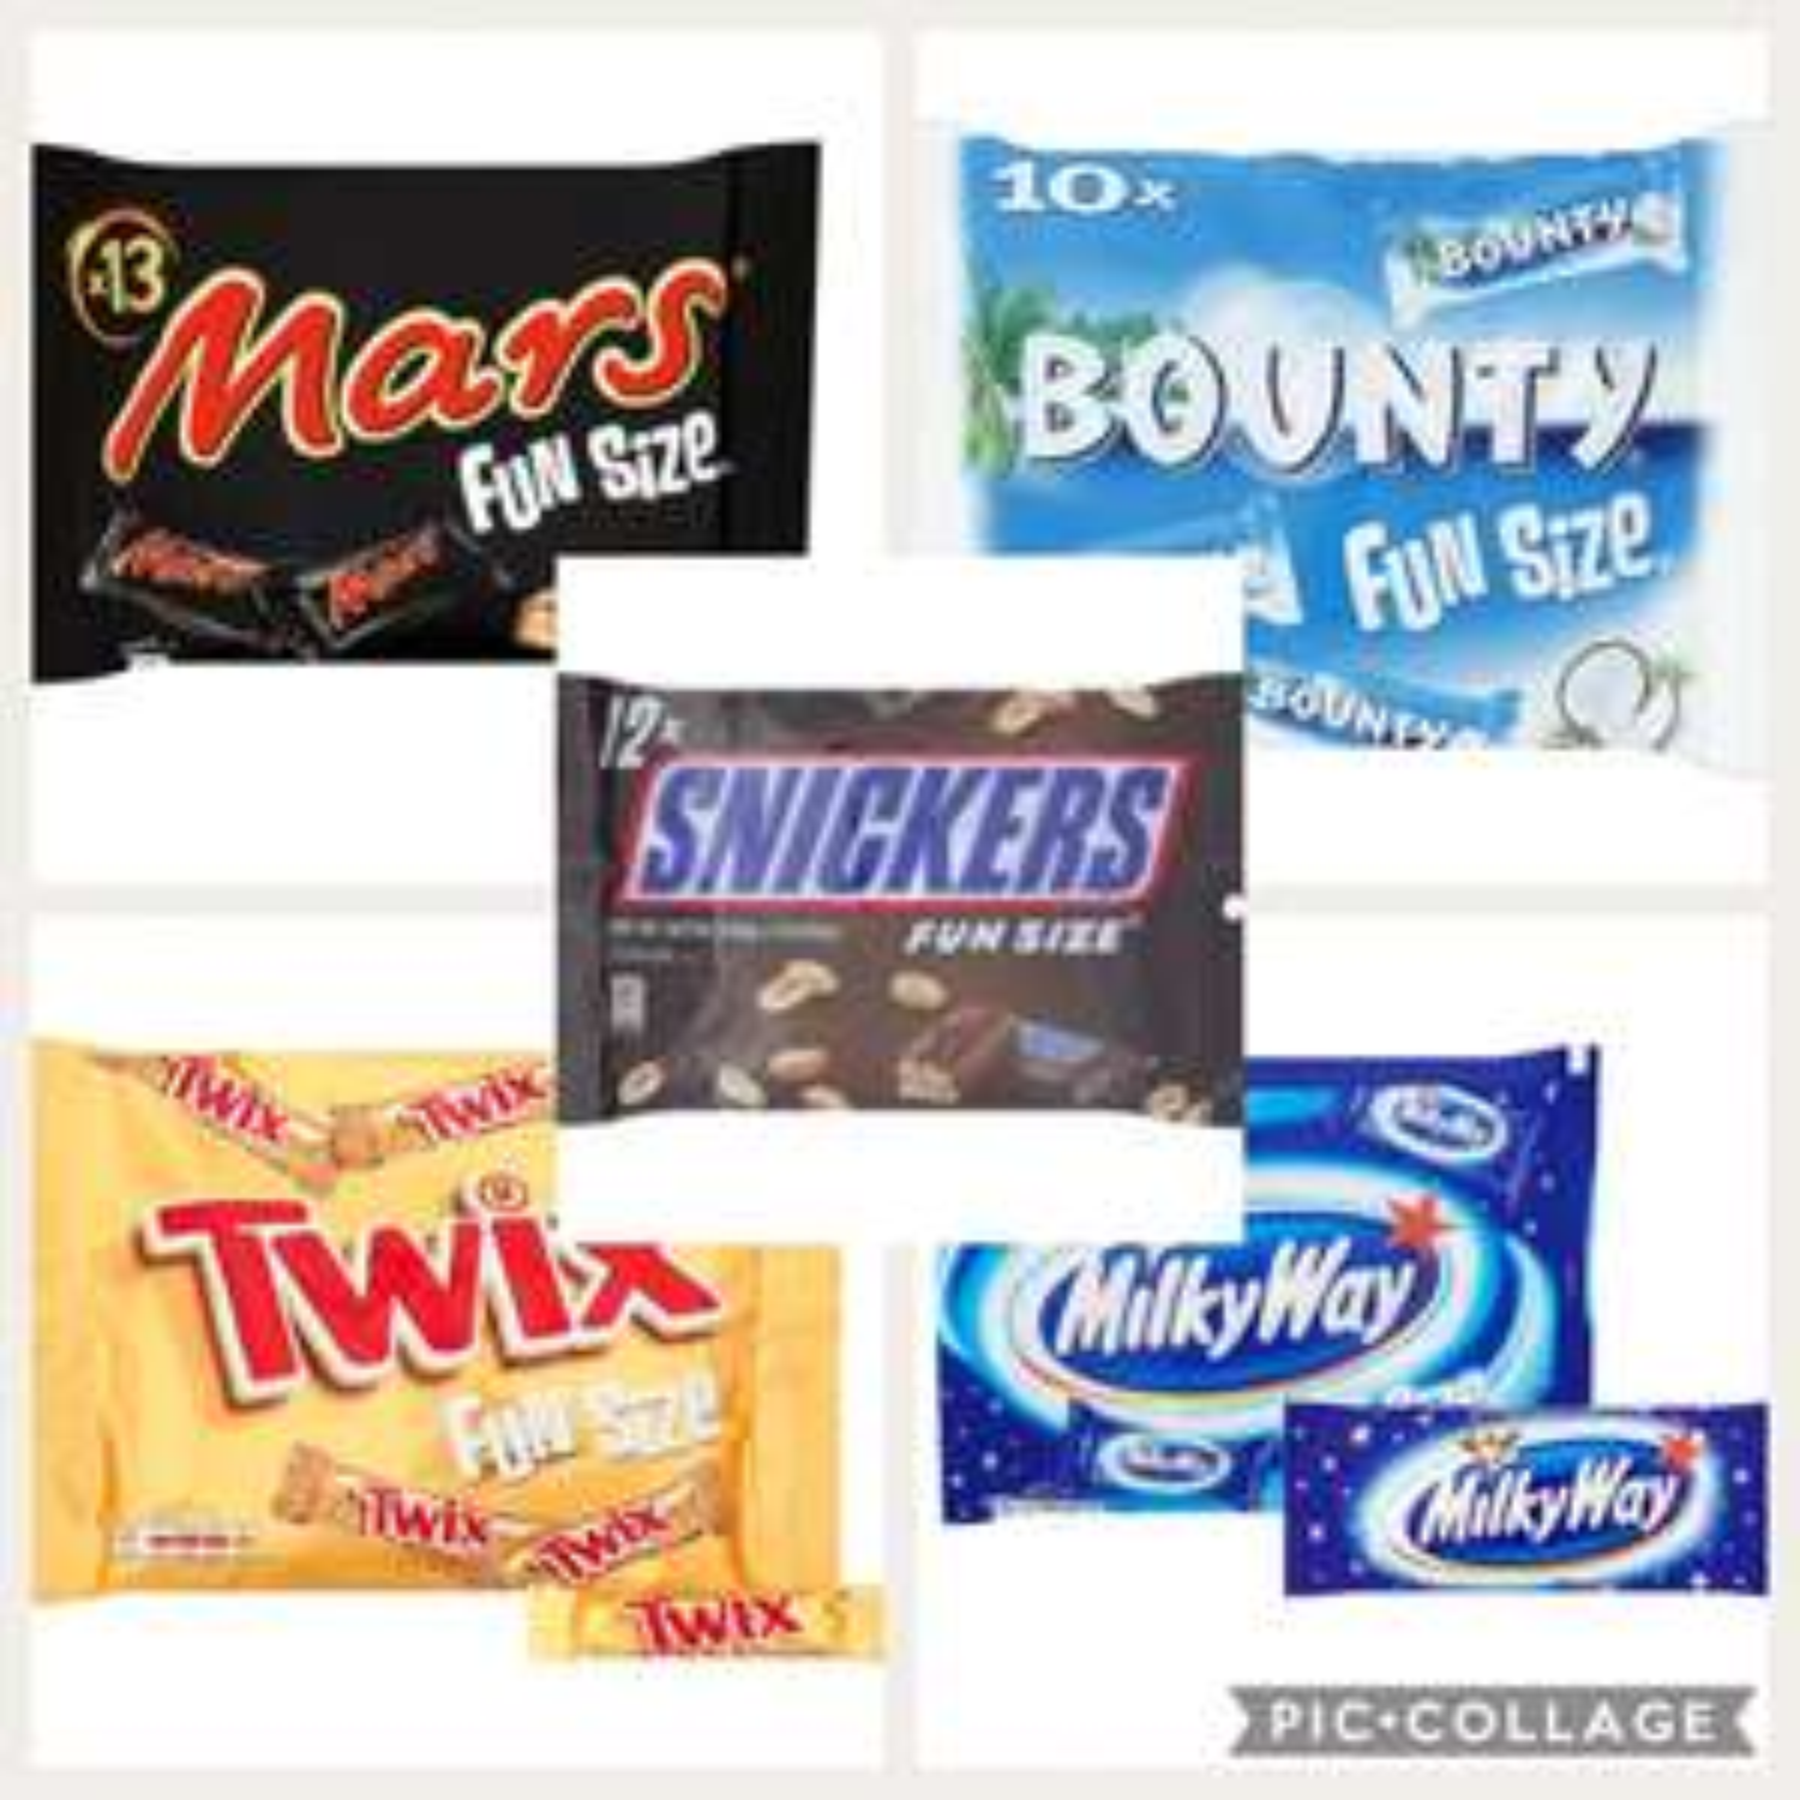 Fun size minis £1 at poundland (mars/snickers/bounty/milky way & twix)